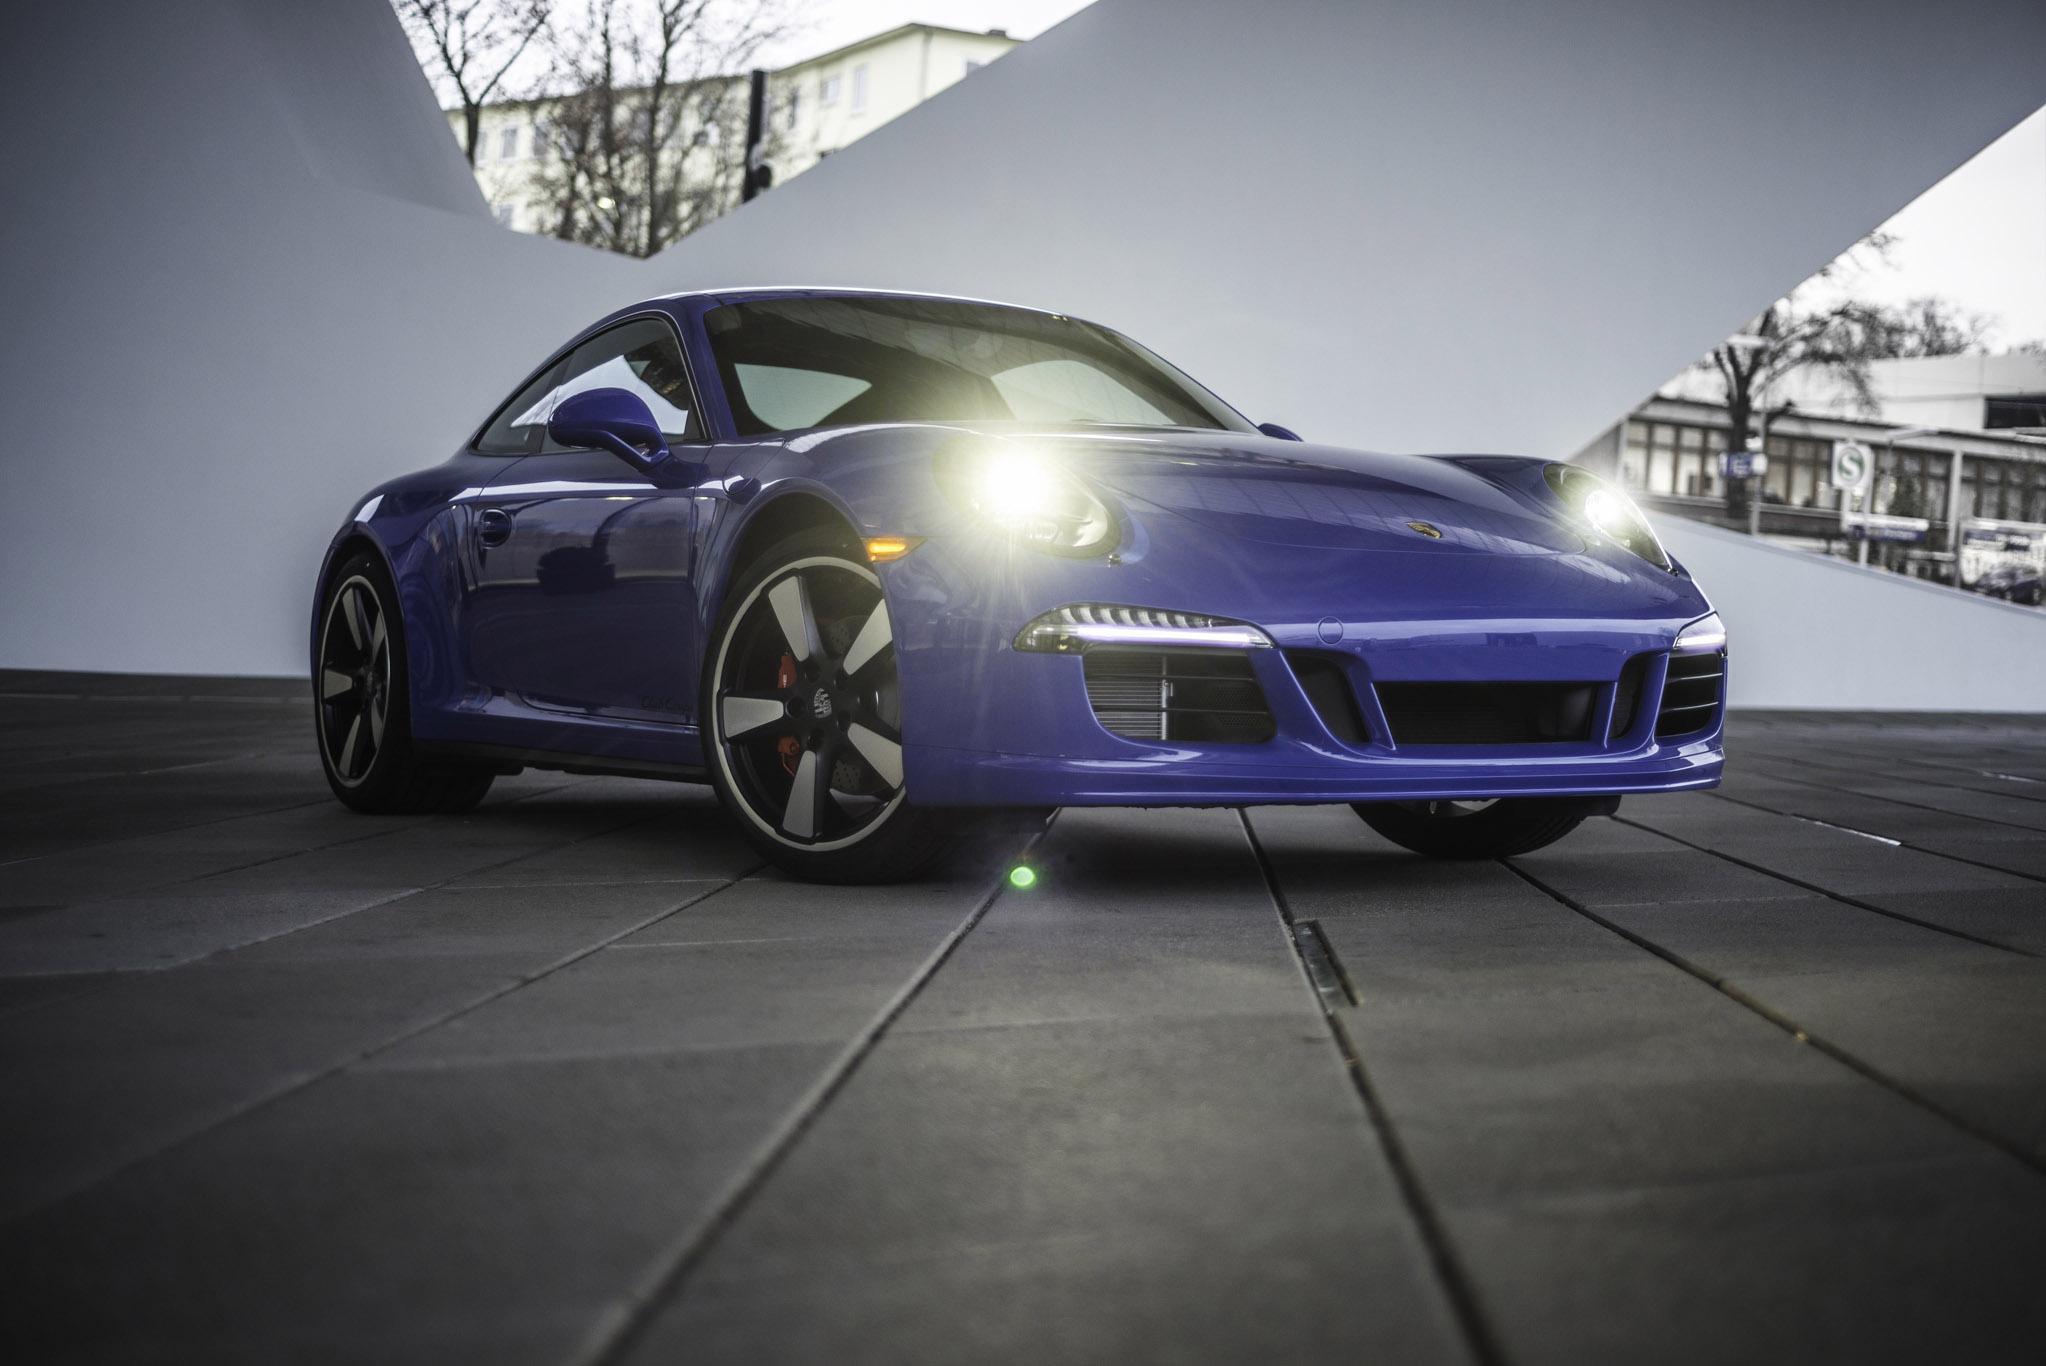 Porsche 911 GTS Club Coupe photo #2